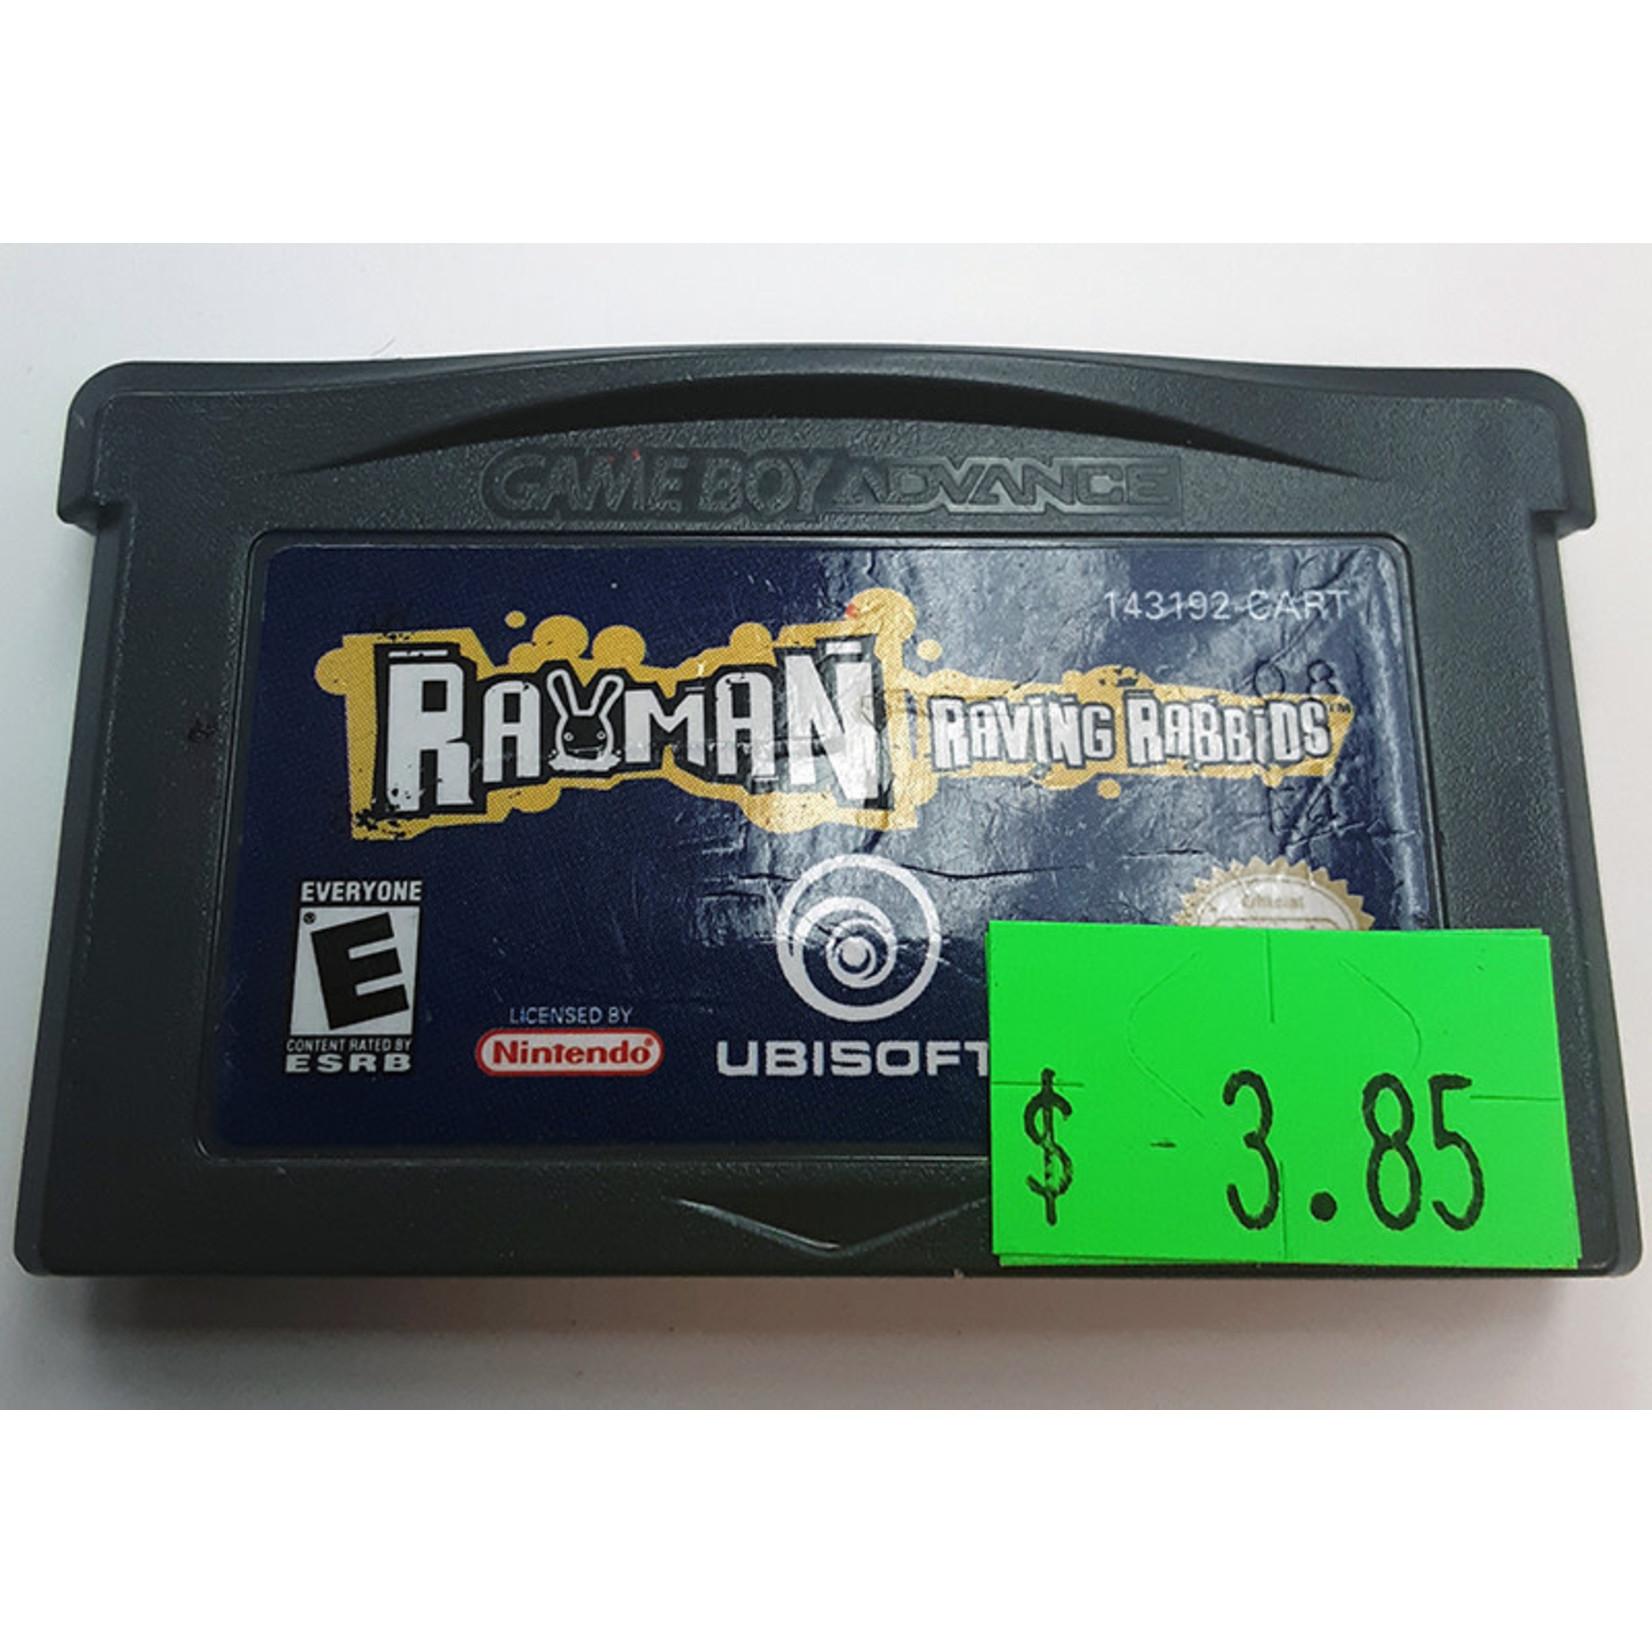 GBAu-Rayman Raving Rabbids (cartridge)